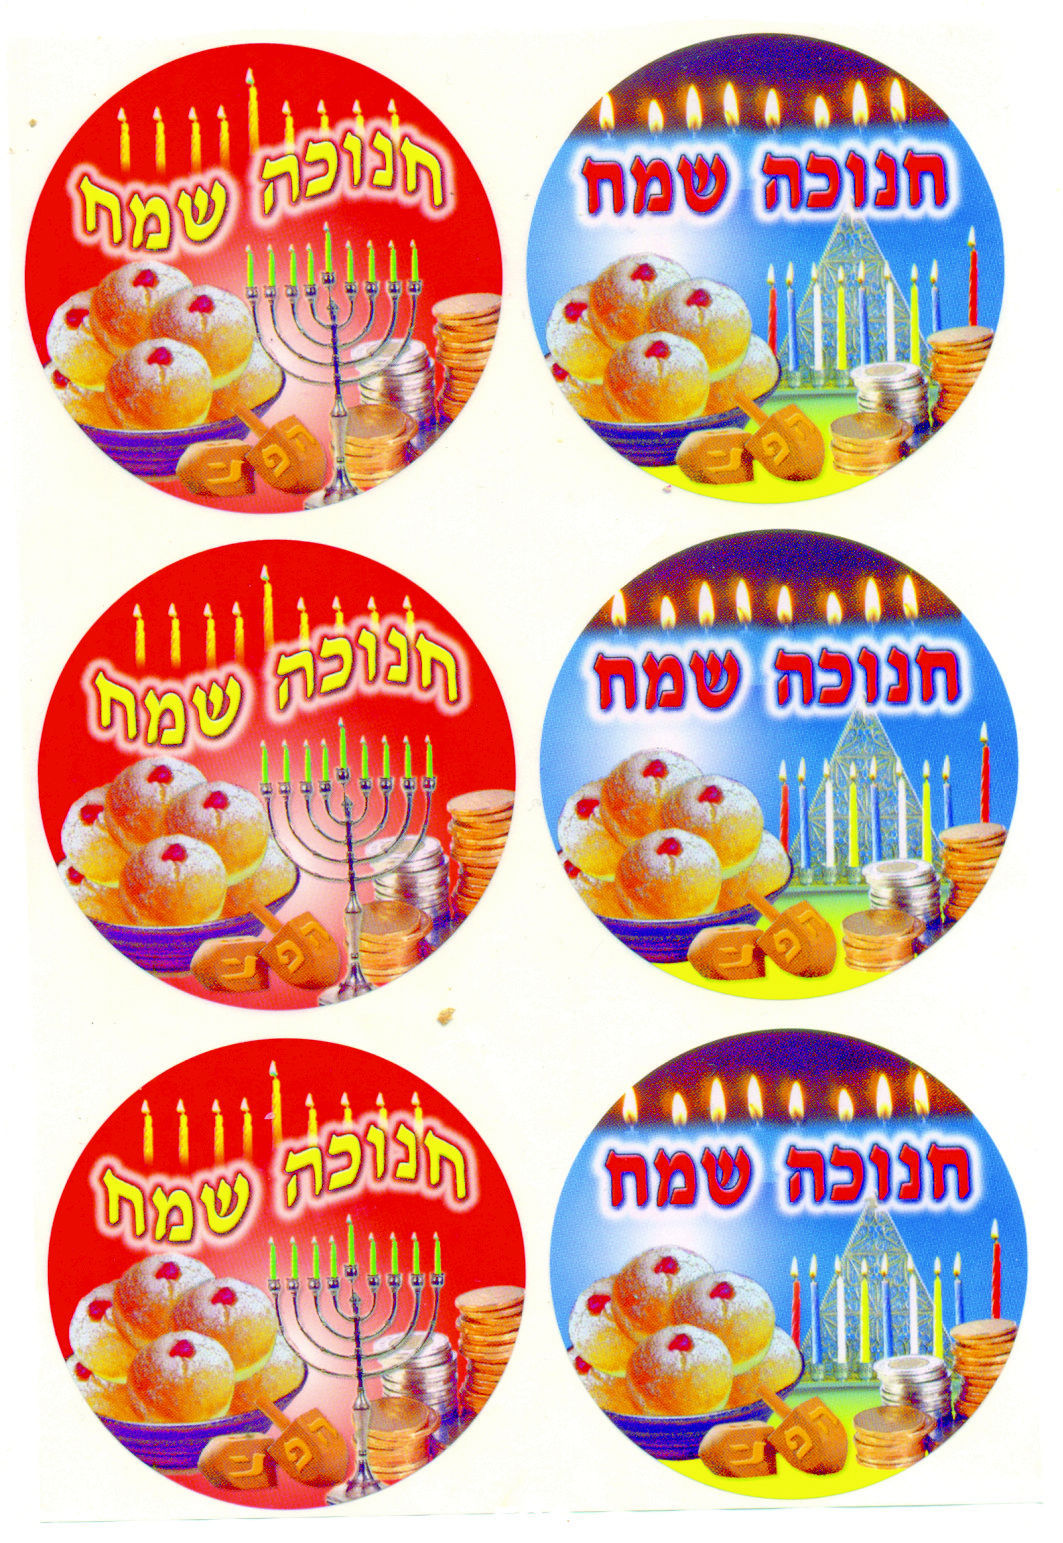 Judaica Hanukkah Chanuka Stickers Children Teaching Aid Israel Hebrew Lot of 36